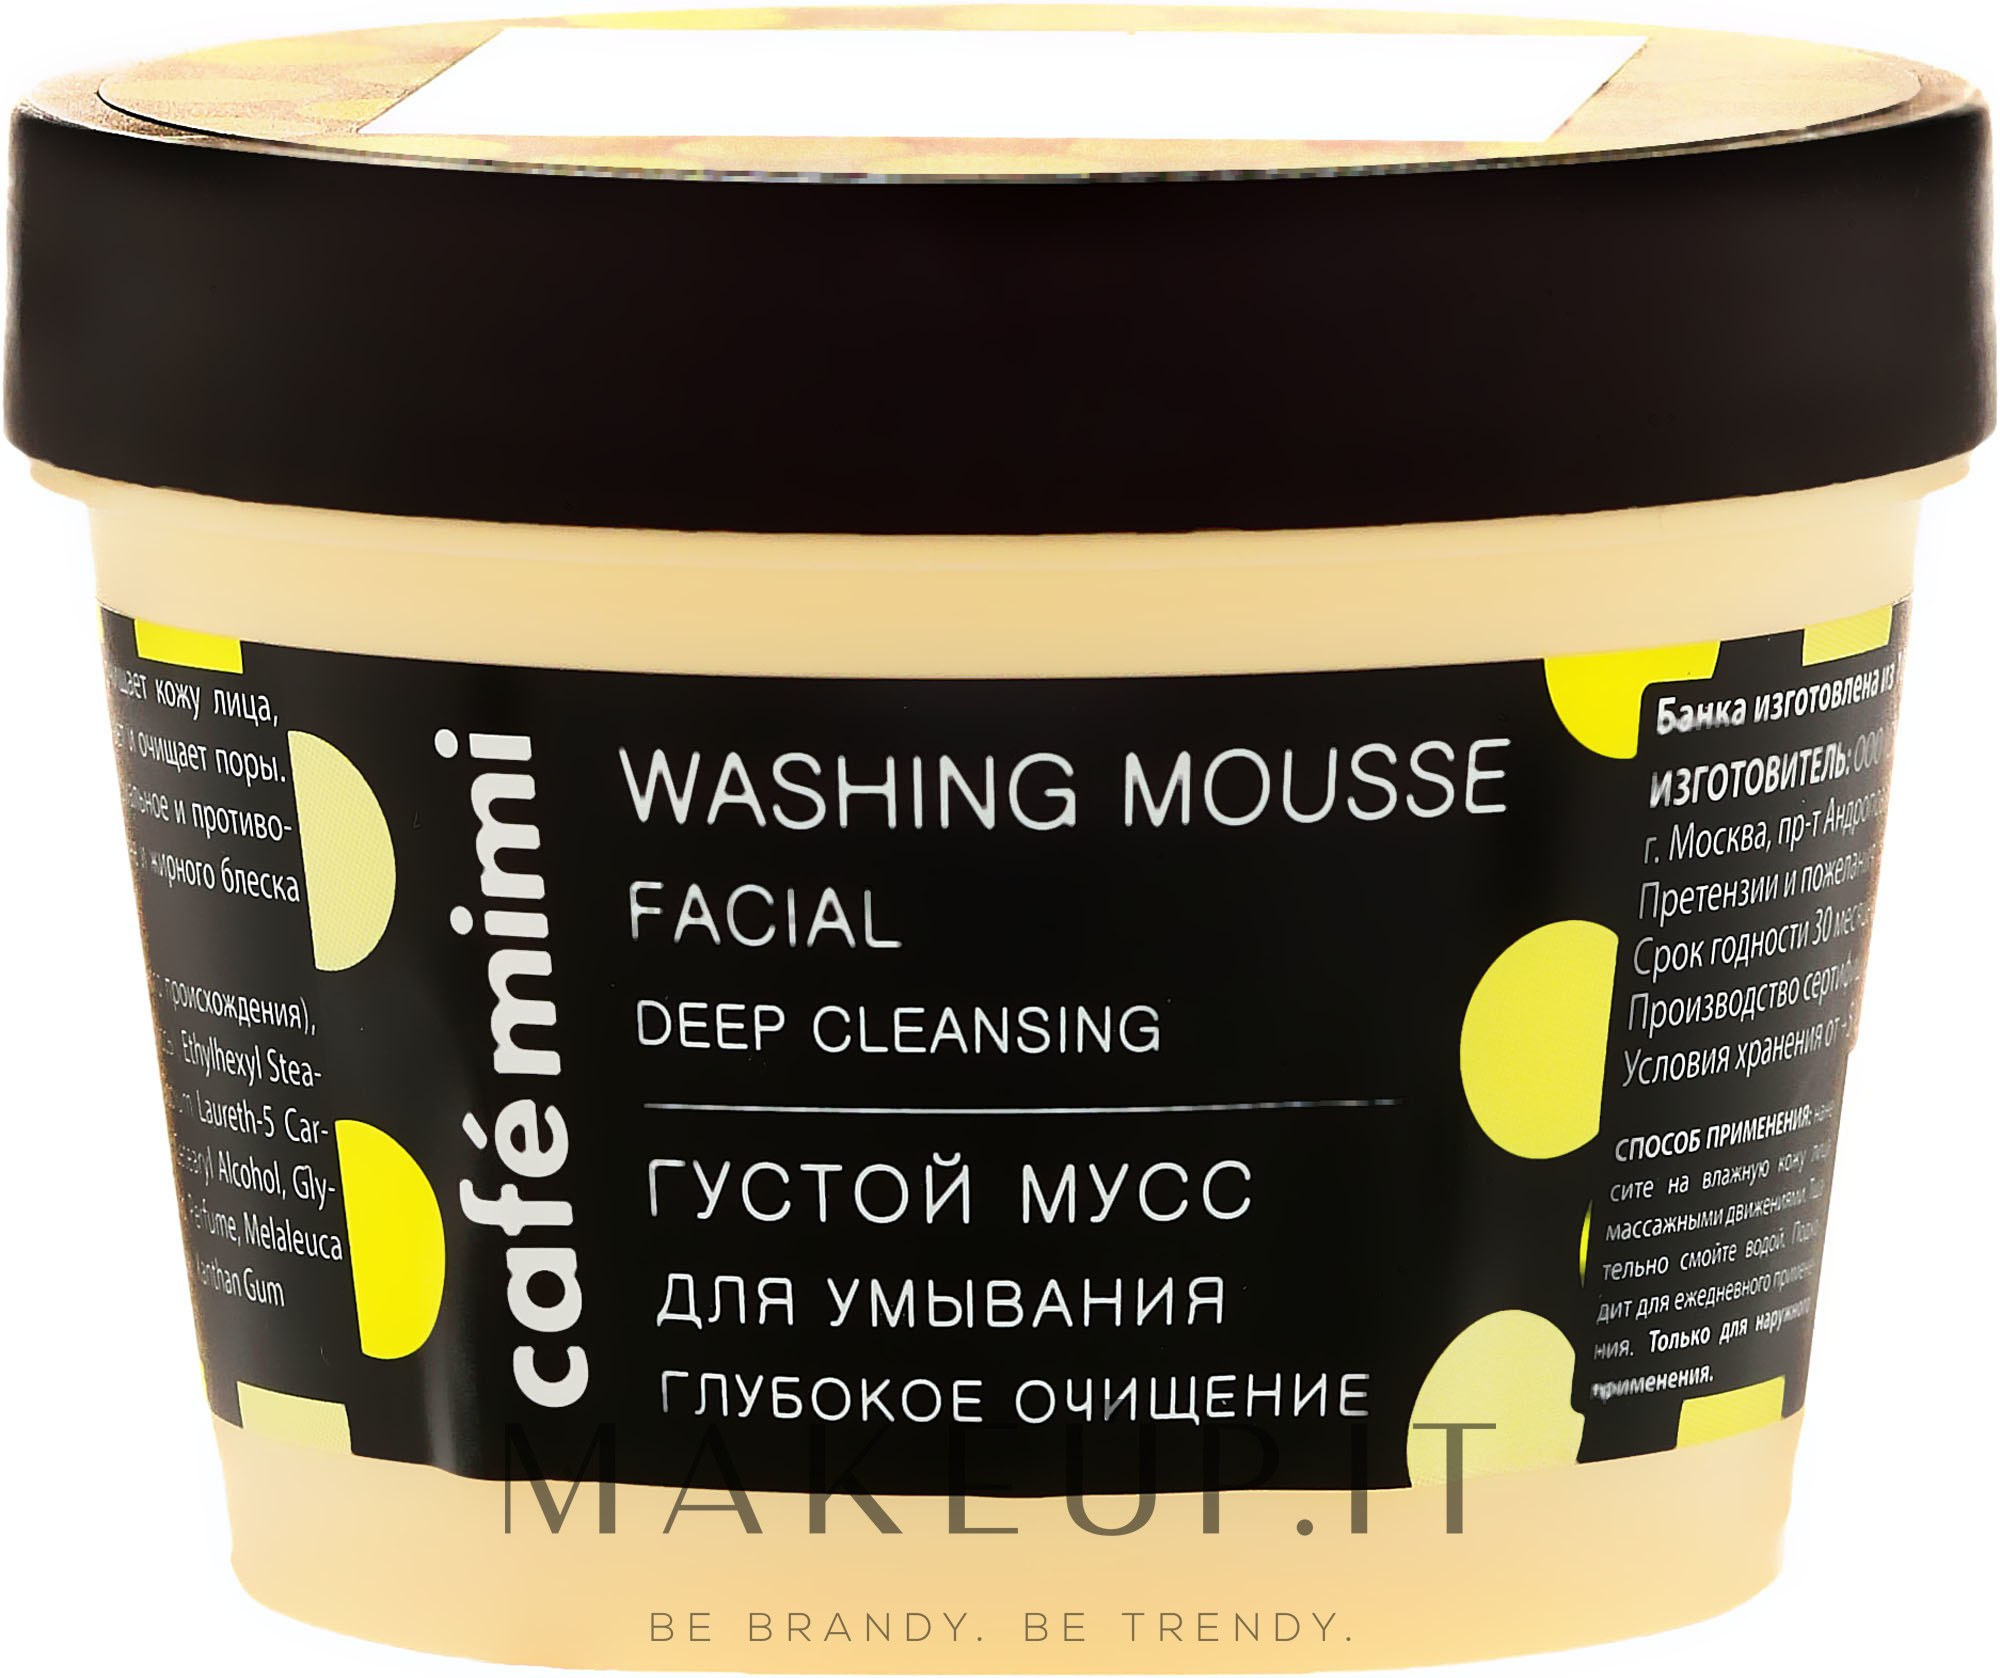 "Mousse detergente ""Pulizia profonda"" - Cafe Mimi Washing Mousse Facial Deep Cleaning — foto 110 ml"